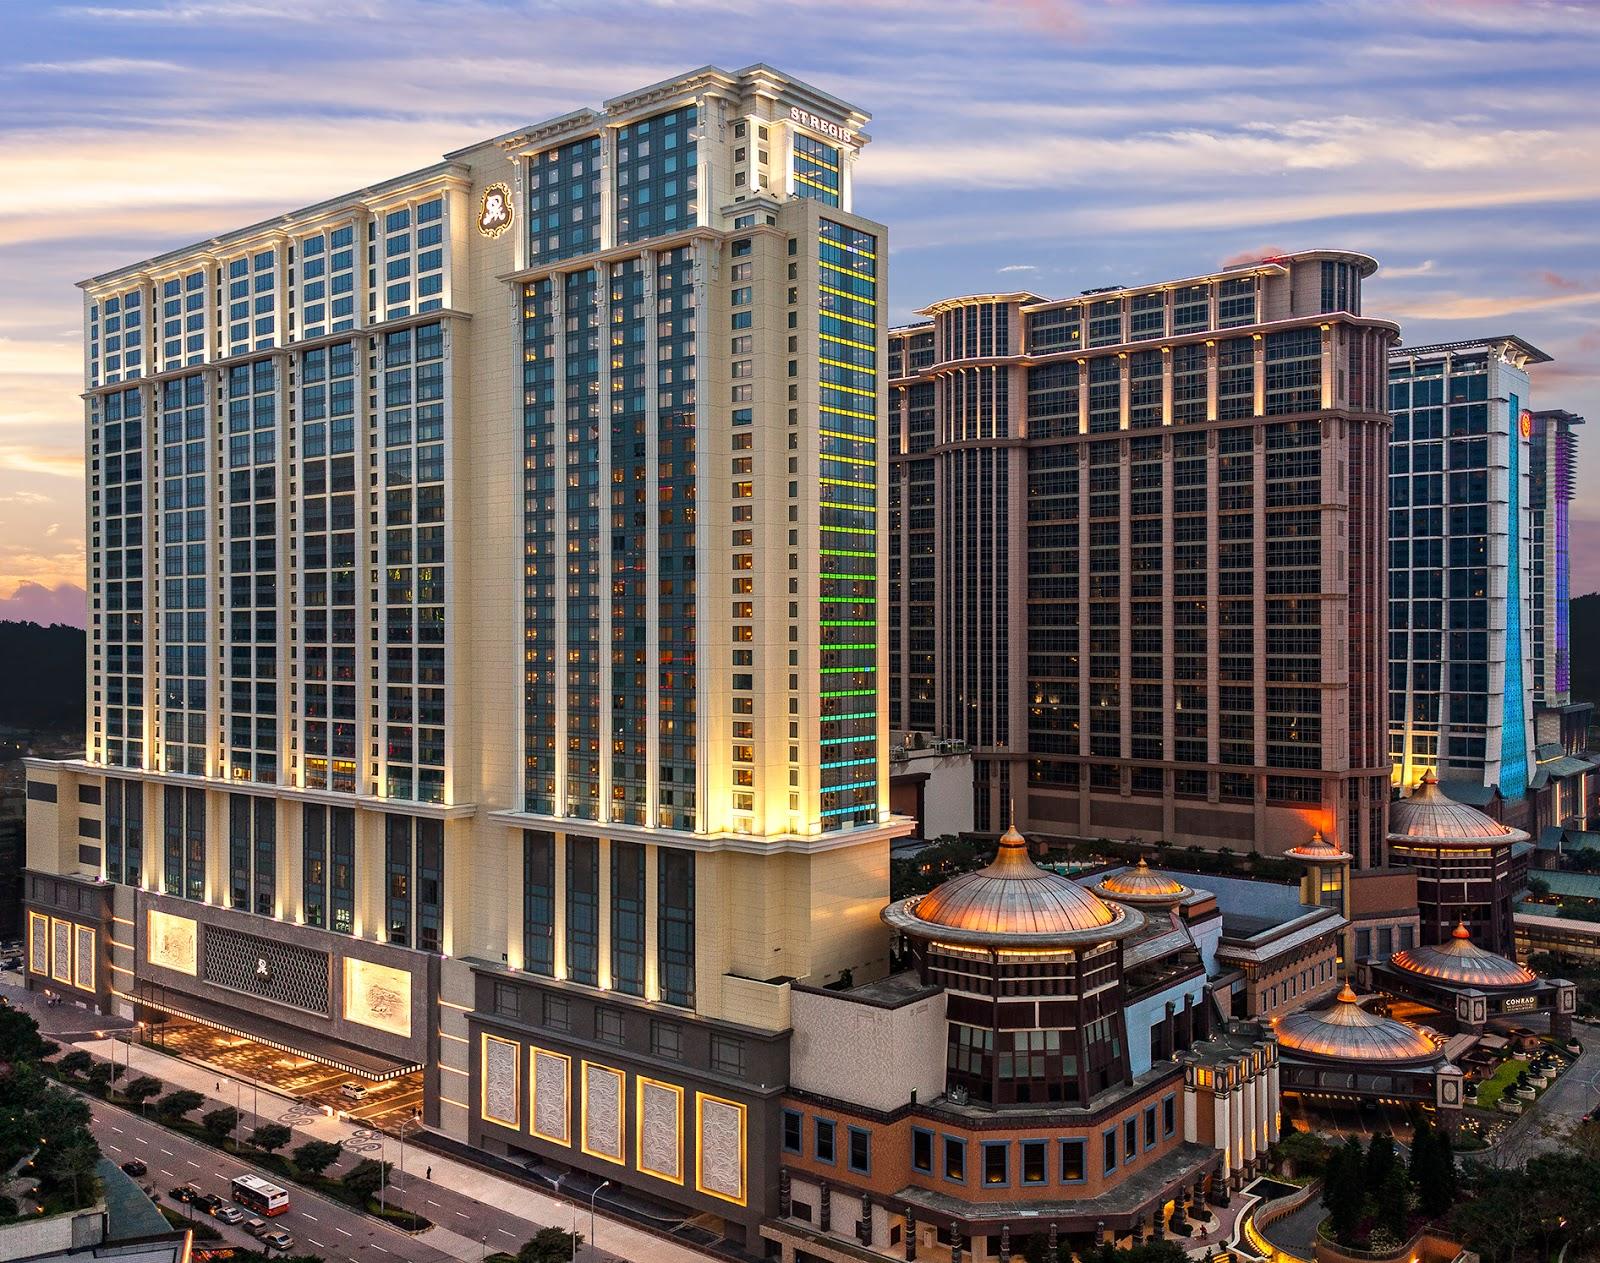 Sheraton Grand Hotel Macau